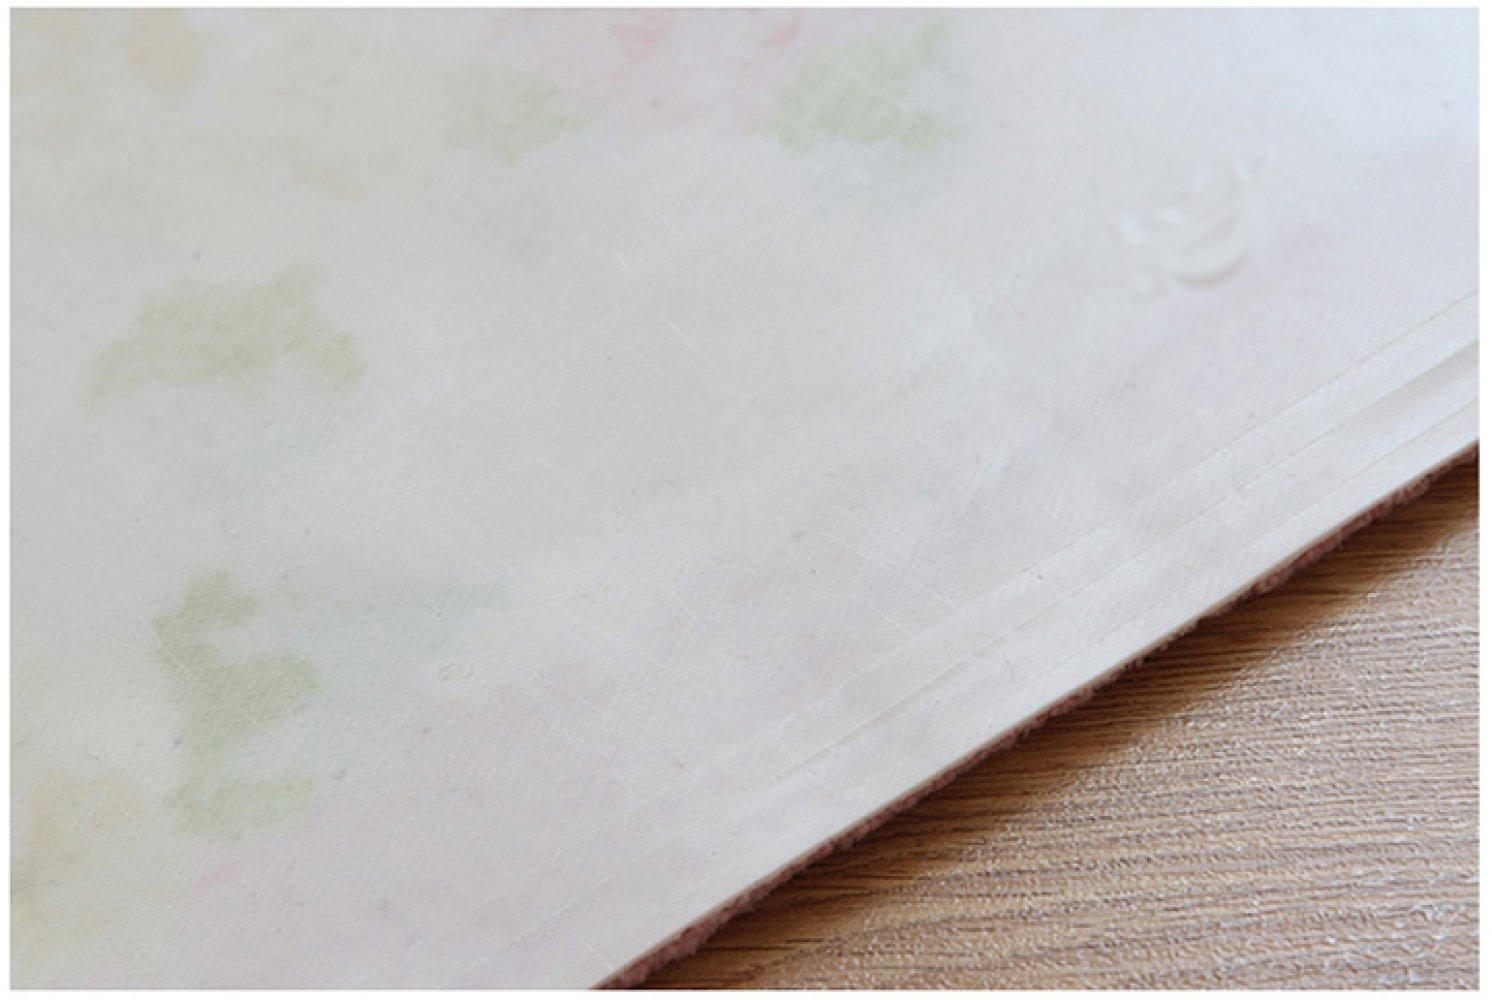 BCXX WLQ Matte - halbkreisförmige absorbierende Tür Tür Tür Matte - Küche Schlafzimmer Badezimmer Matte - Bad Matte B07MJ2P59D Duschmatten e2f7c8